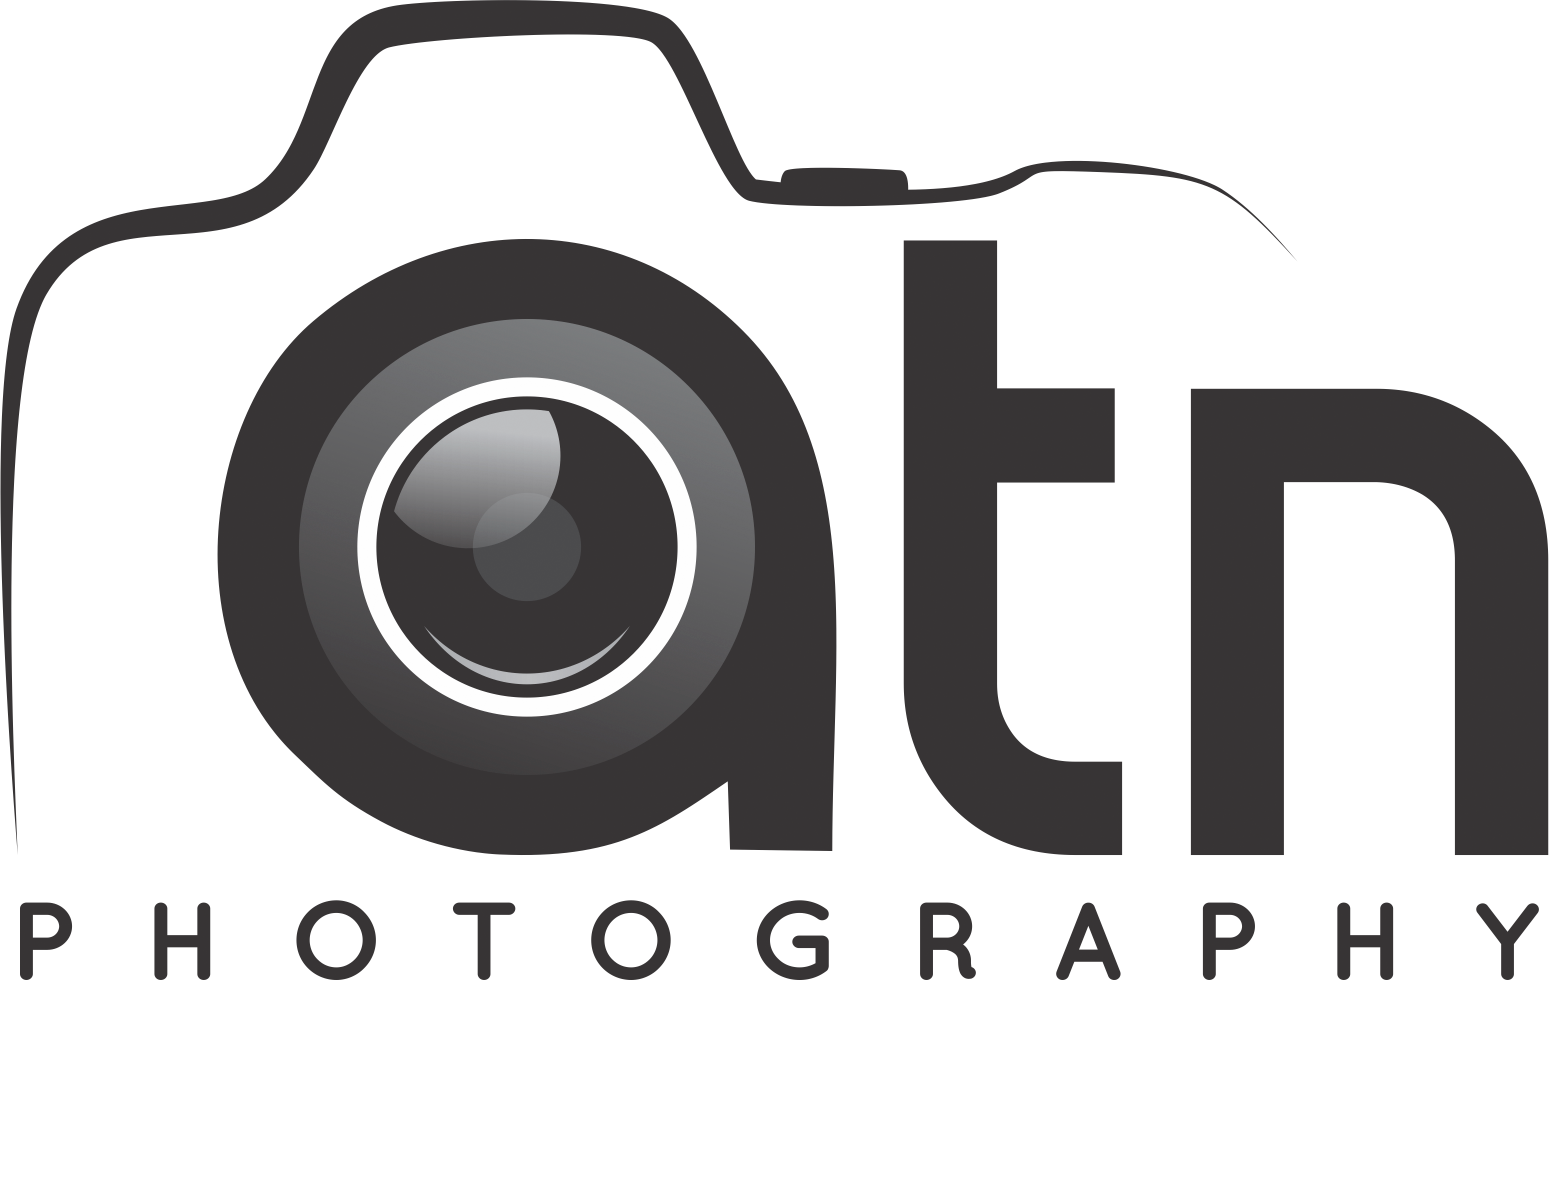 Photographer videographer